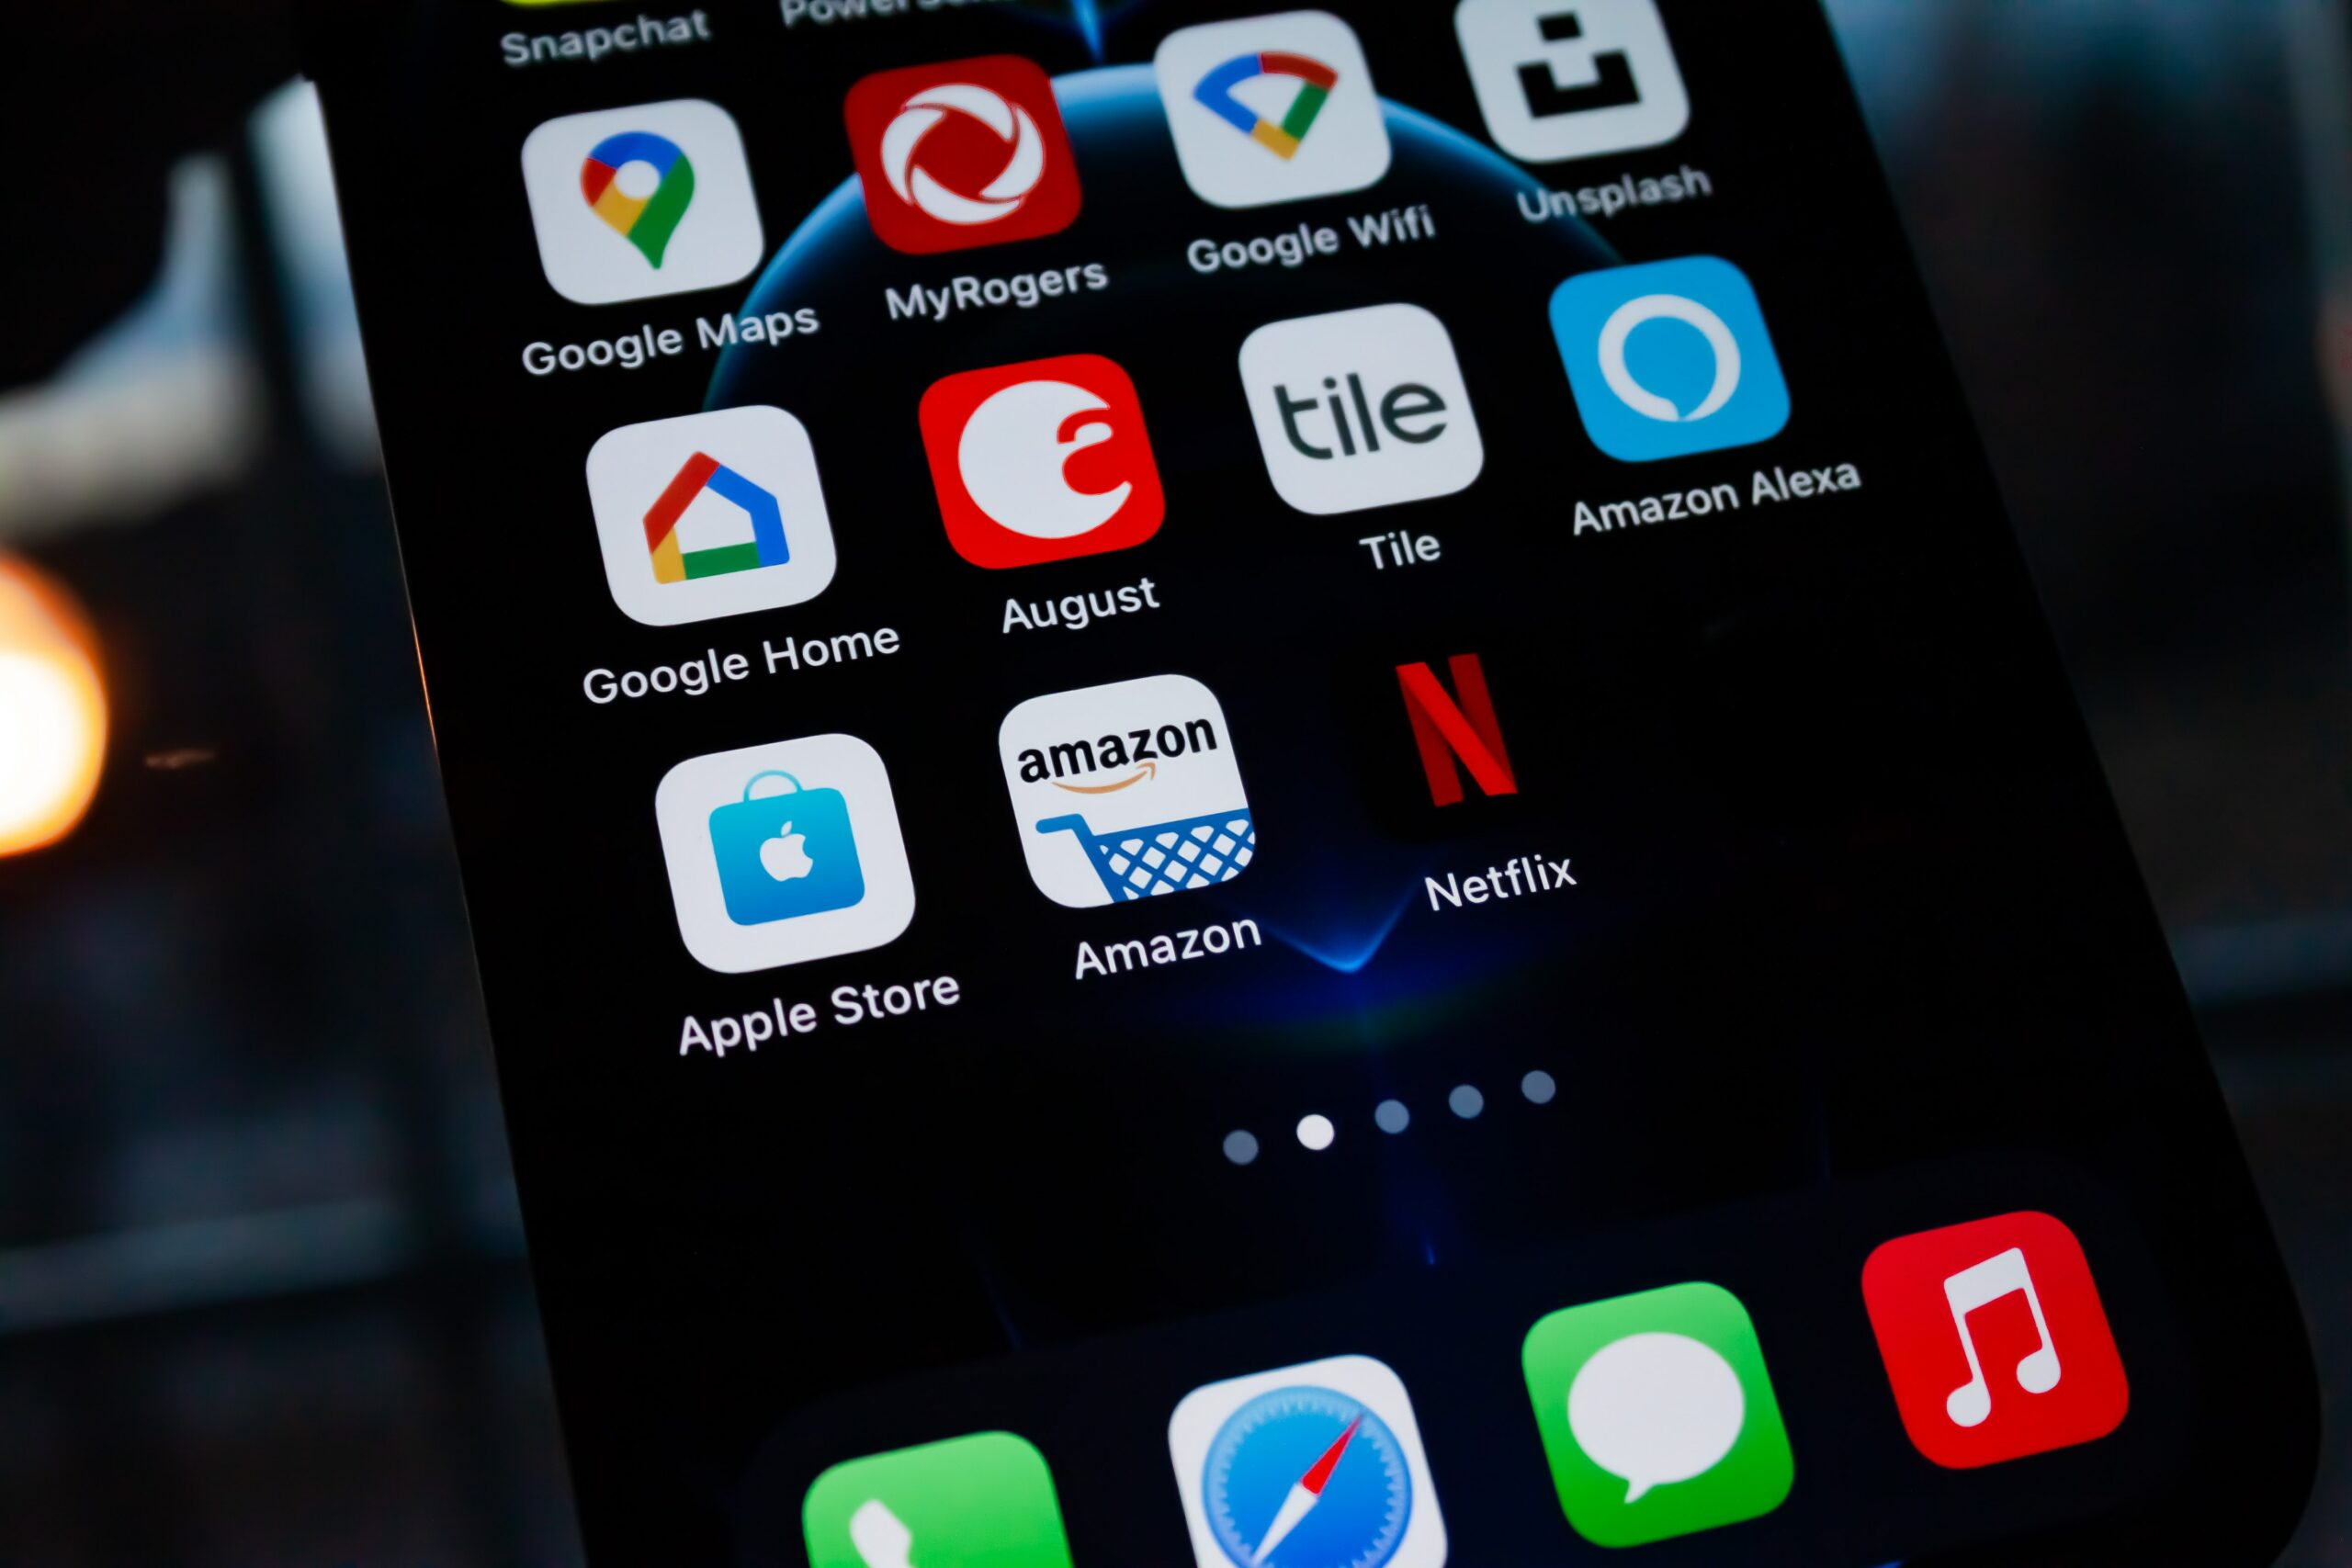 Cara Berlangganan Netflix di iPhone dan iPad